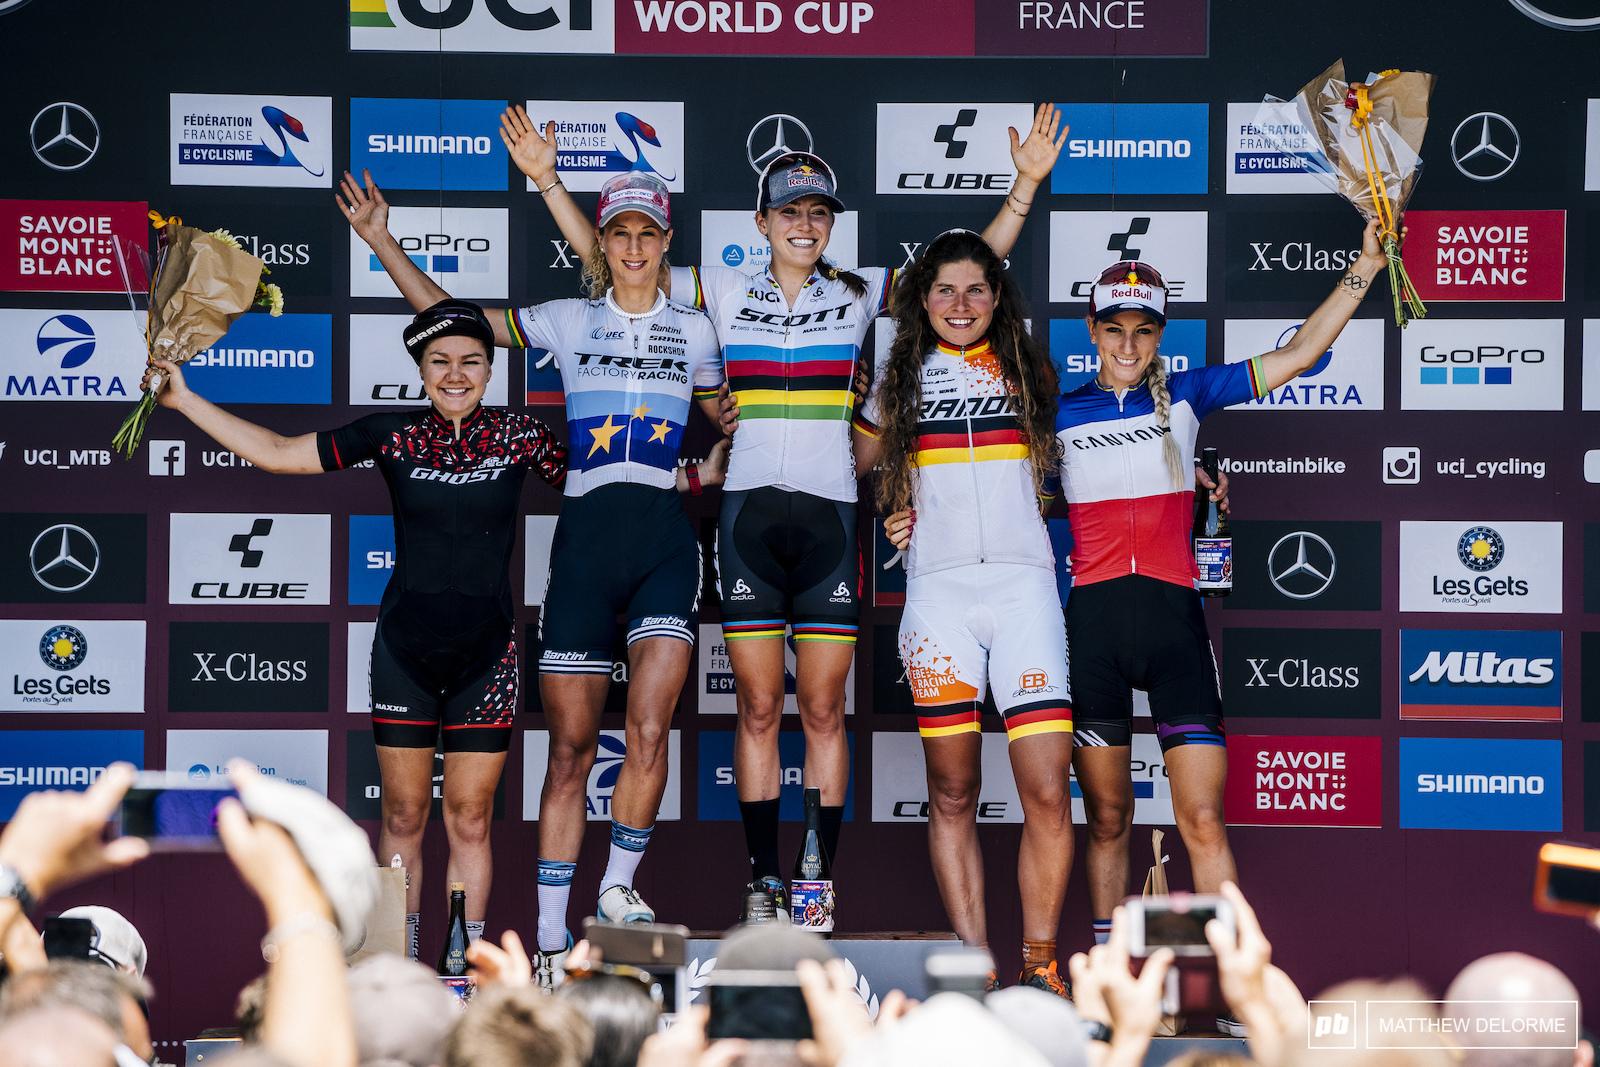 Women s podium- Kate Courtney Jolanda Neff Elisabeth Brandau Sina Frei and Pauline Ferrand Prevot.